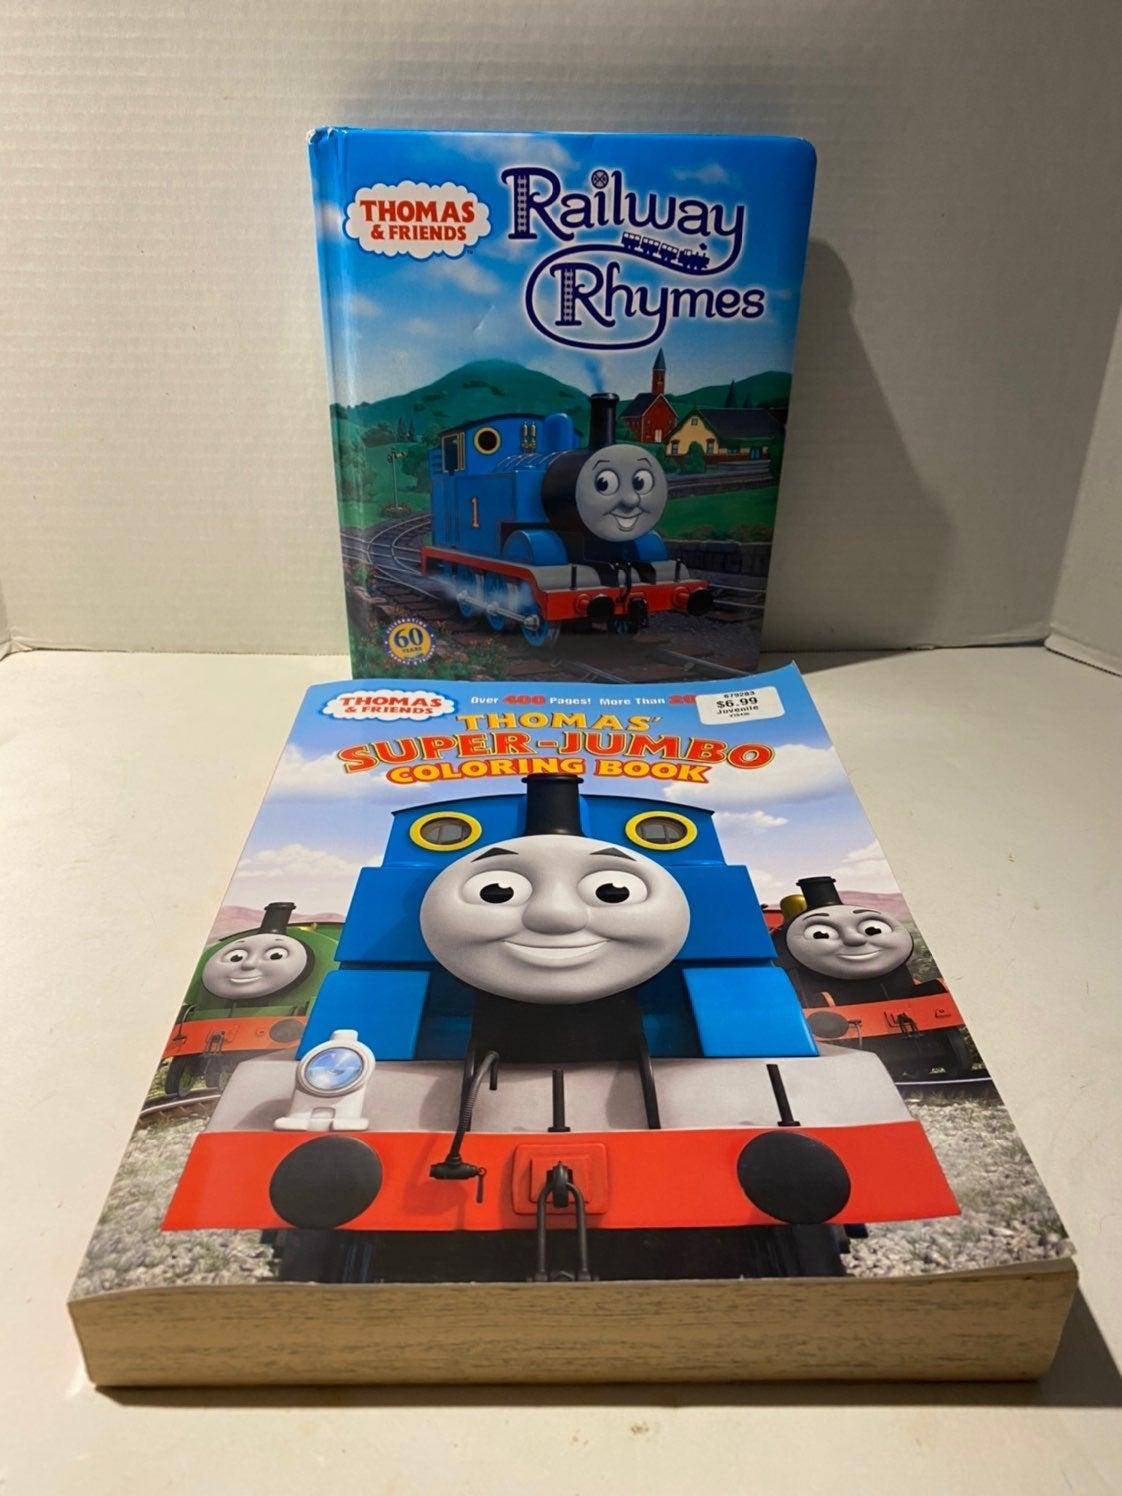 Thomas & Friends Railway Rhymes & more